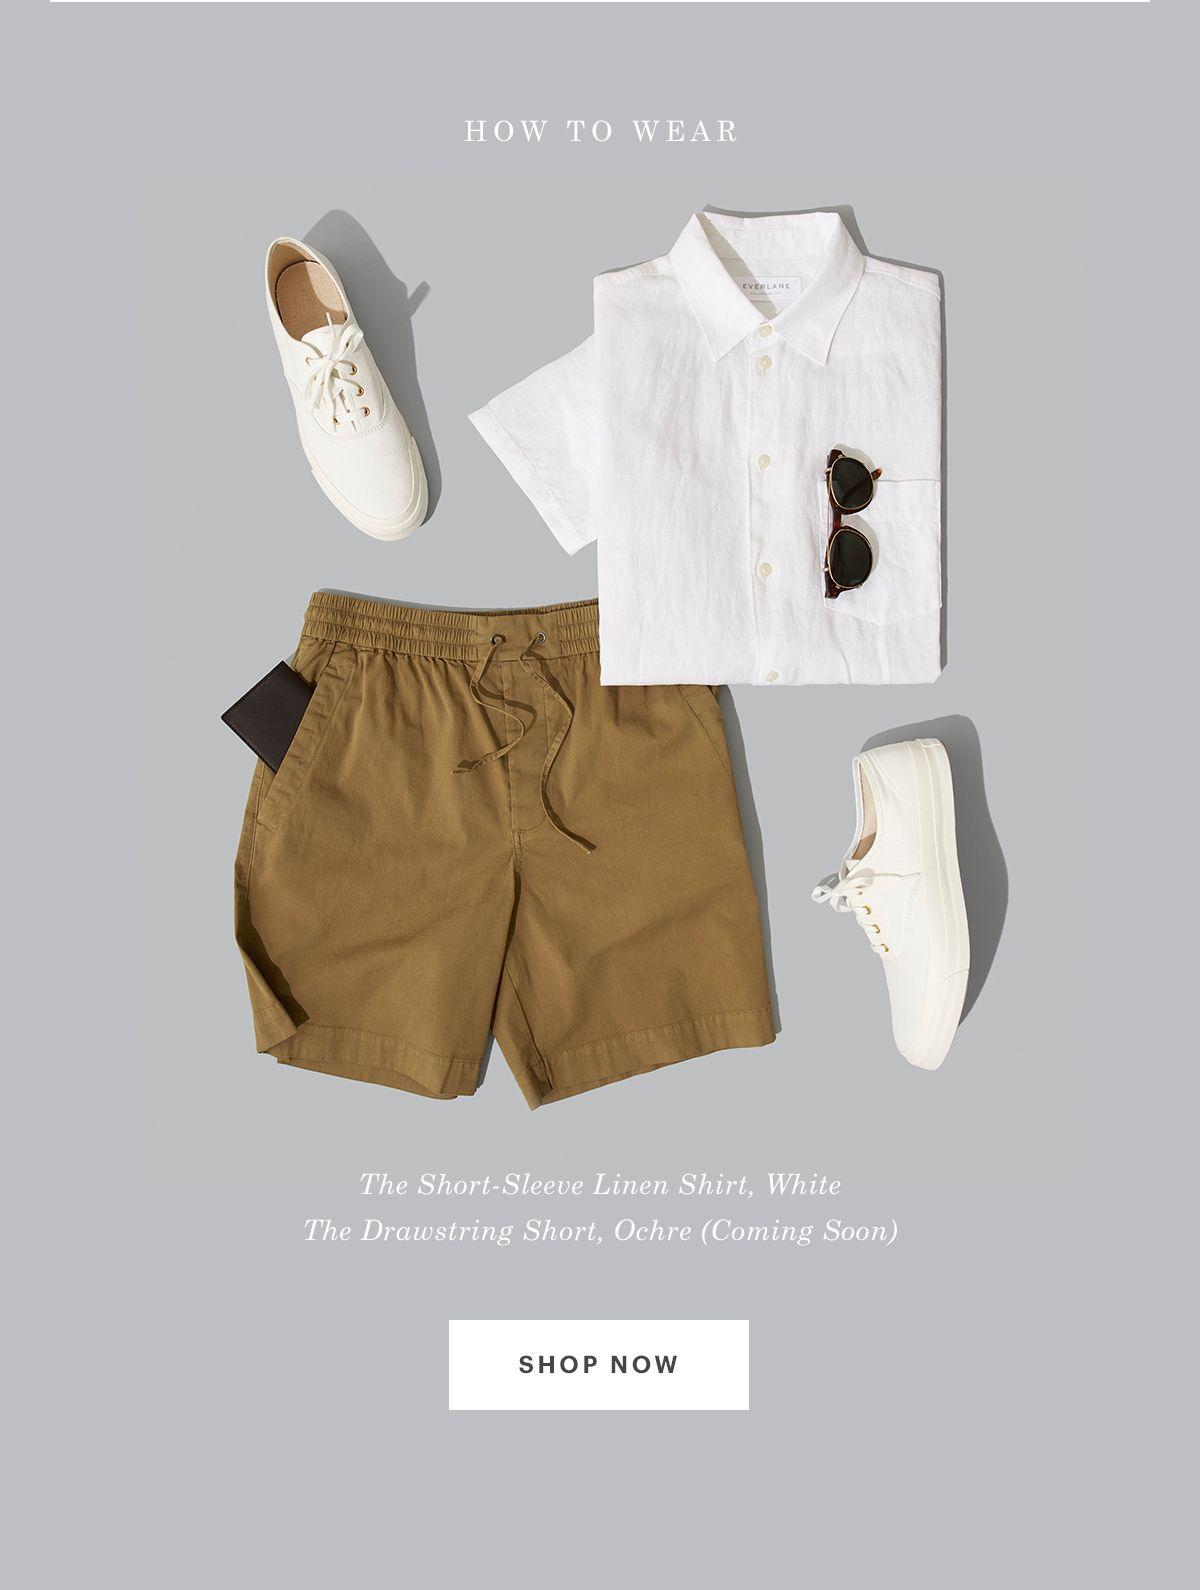 c45c94a1 The Short-Sleeve Linen Shirt, White. The Drawstring Short, Ochre ...